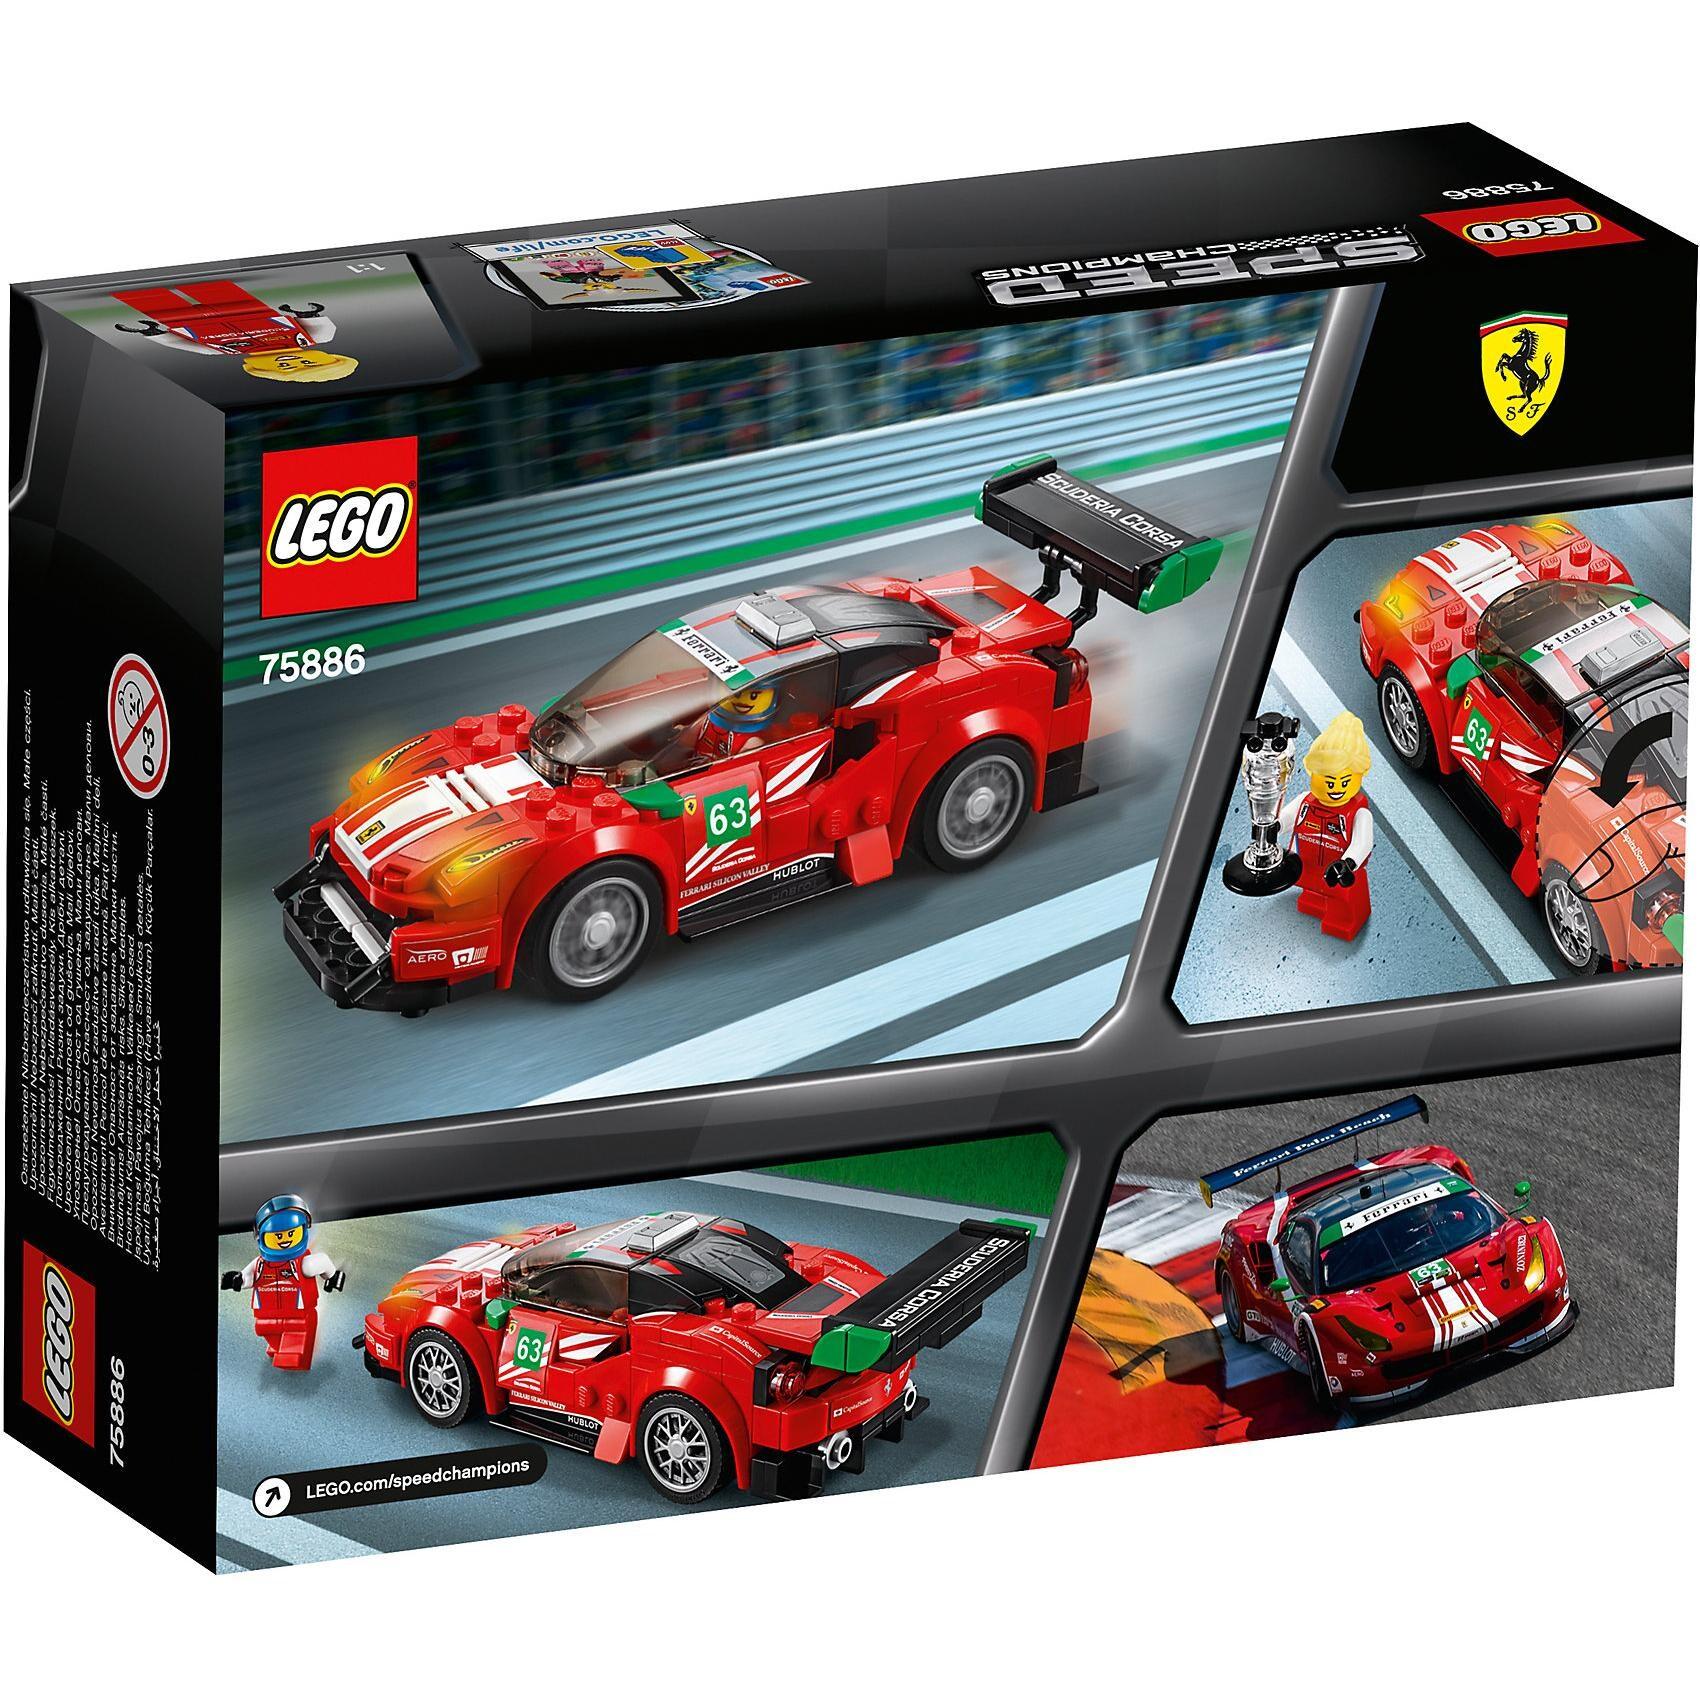 Lego Speed 75886 Ferrari 488 GT3 Scuderia Corsa